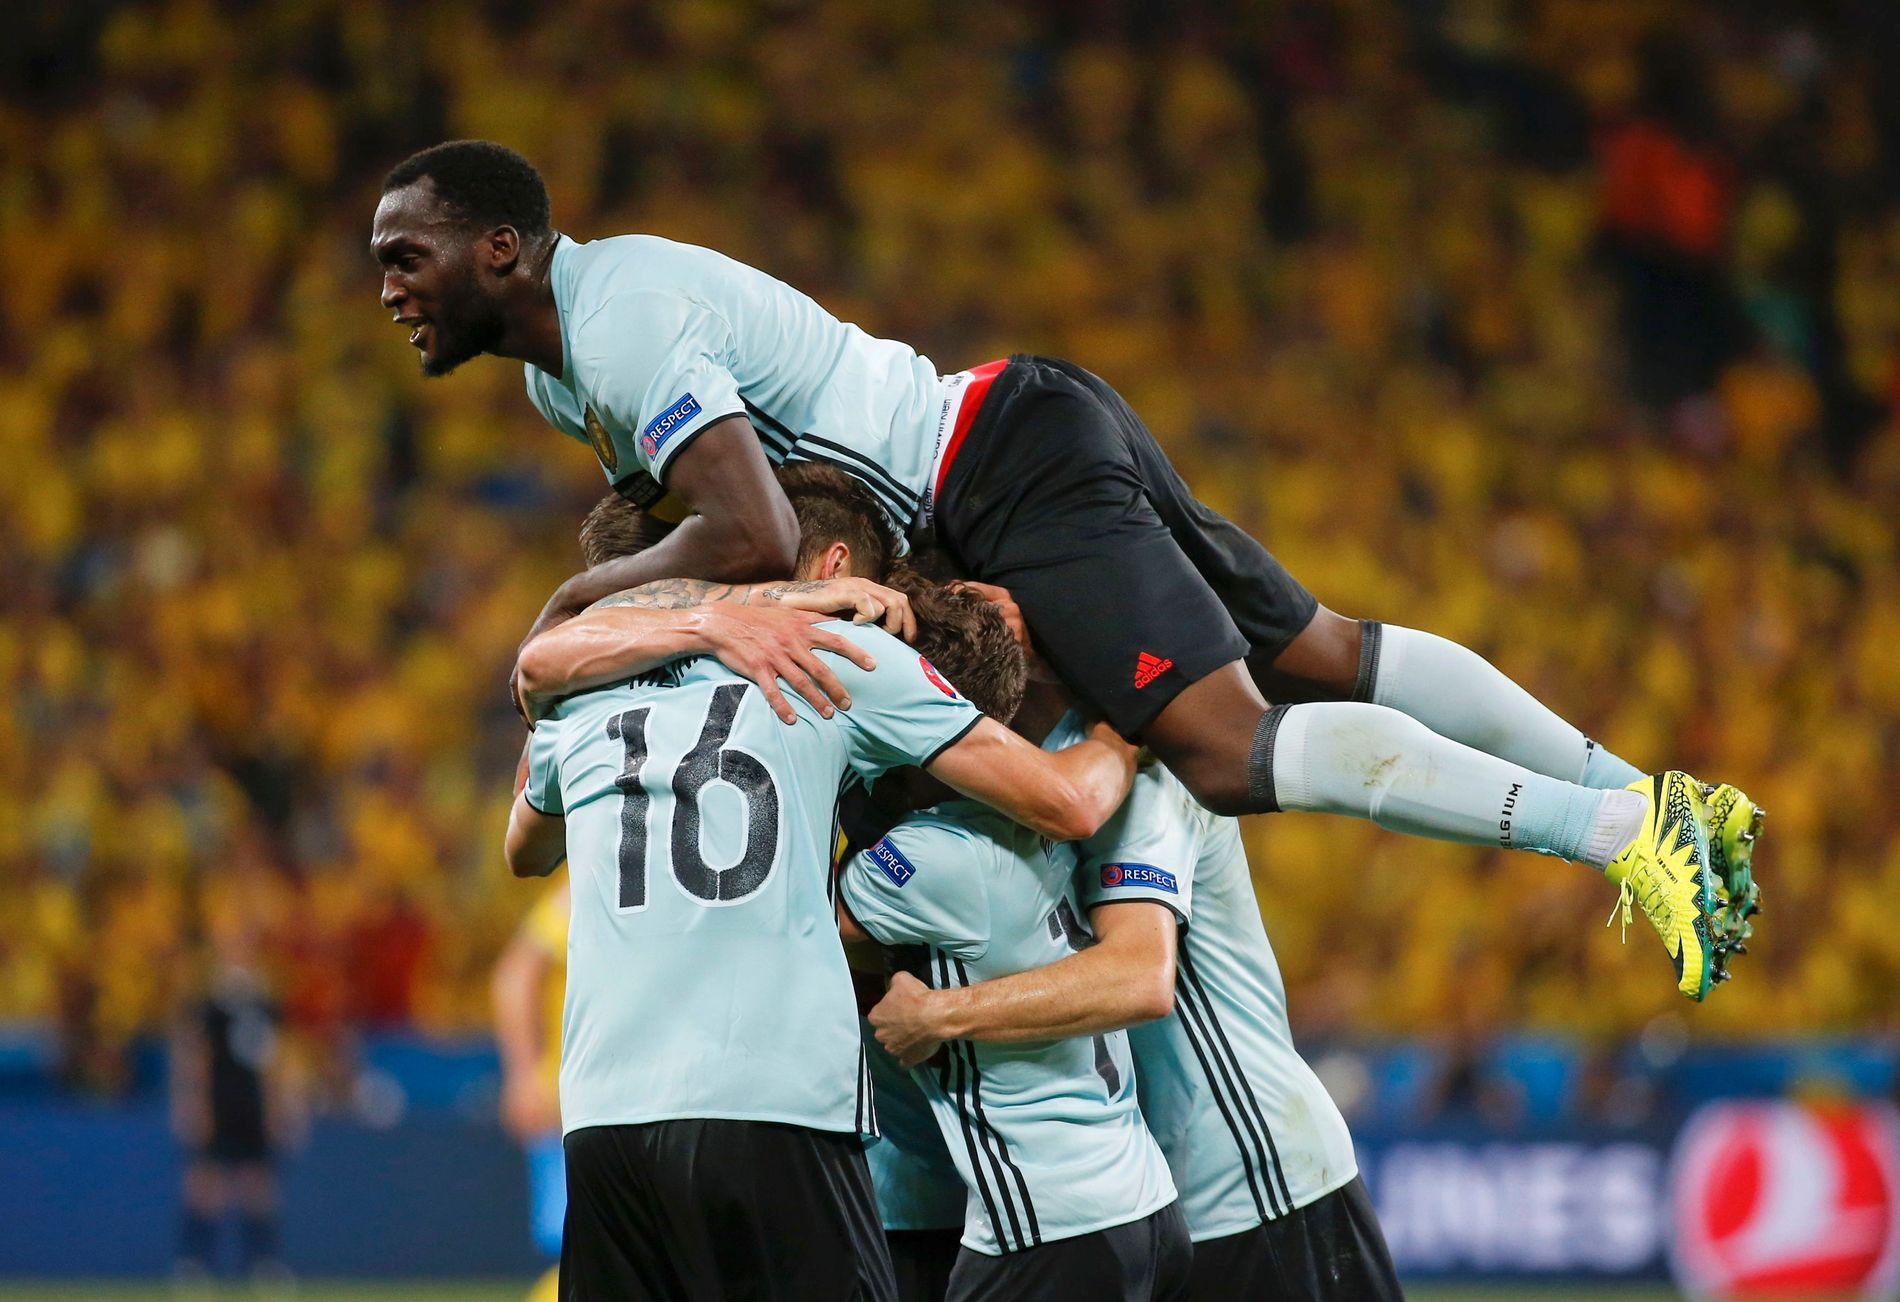 BELGISK JUBEL: Belgias spillere feirer målet som tok dem videre i EM. De møter Ungarn i åttendedelsfinalen.